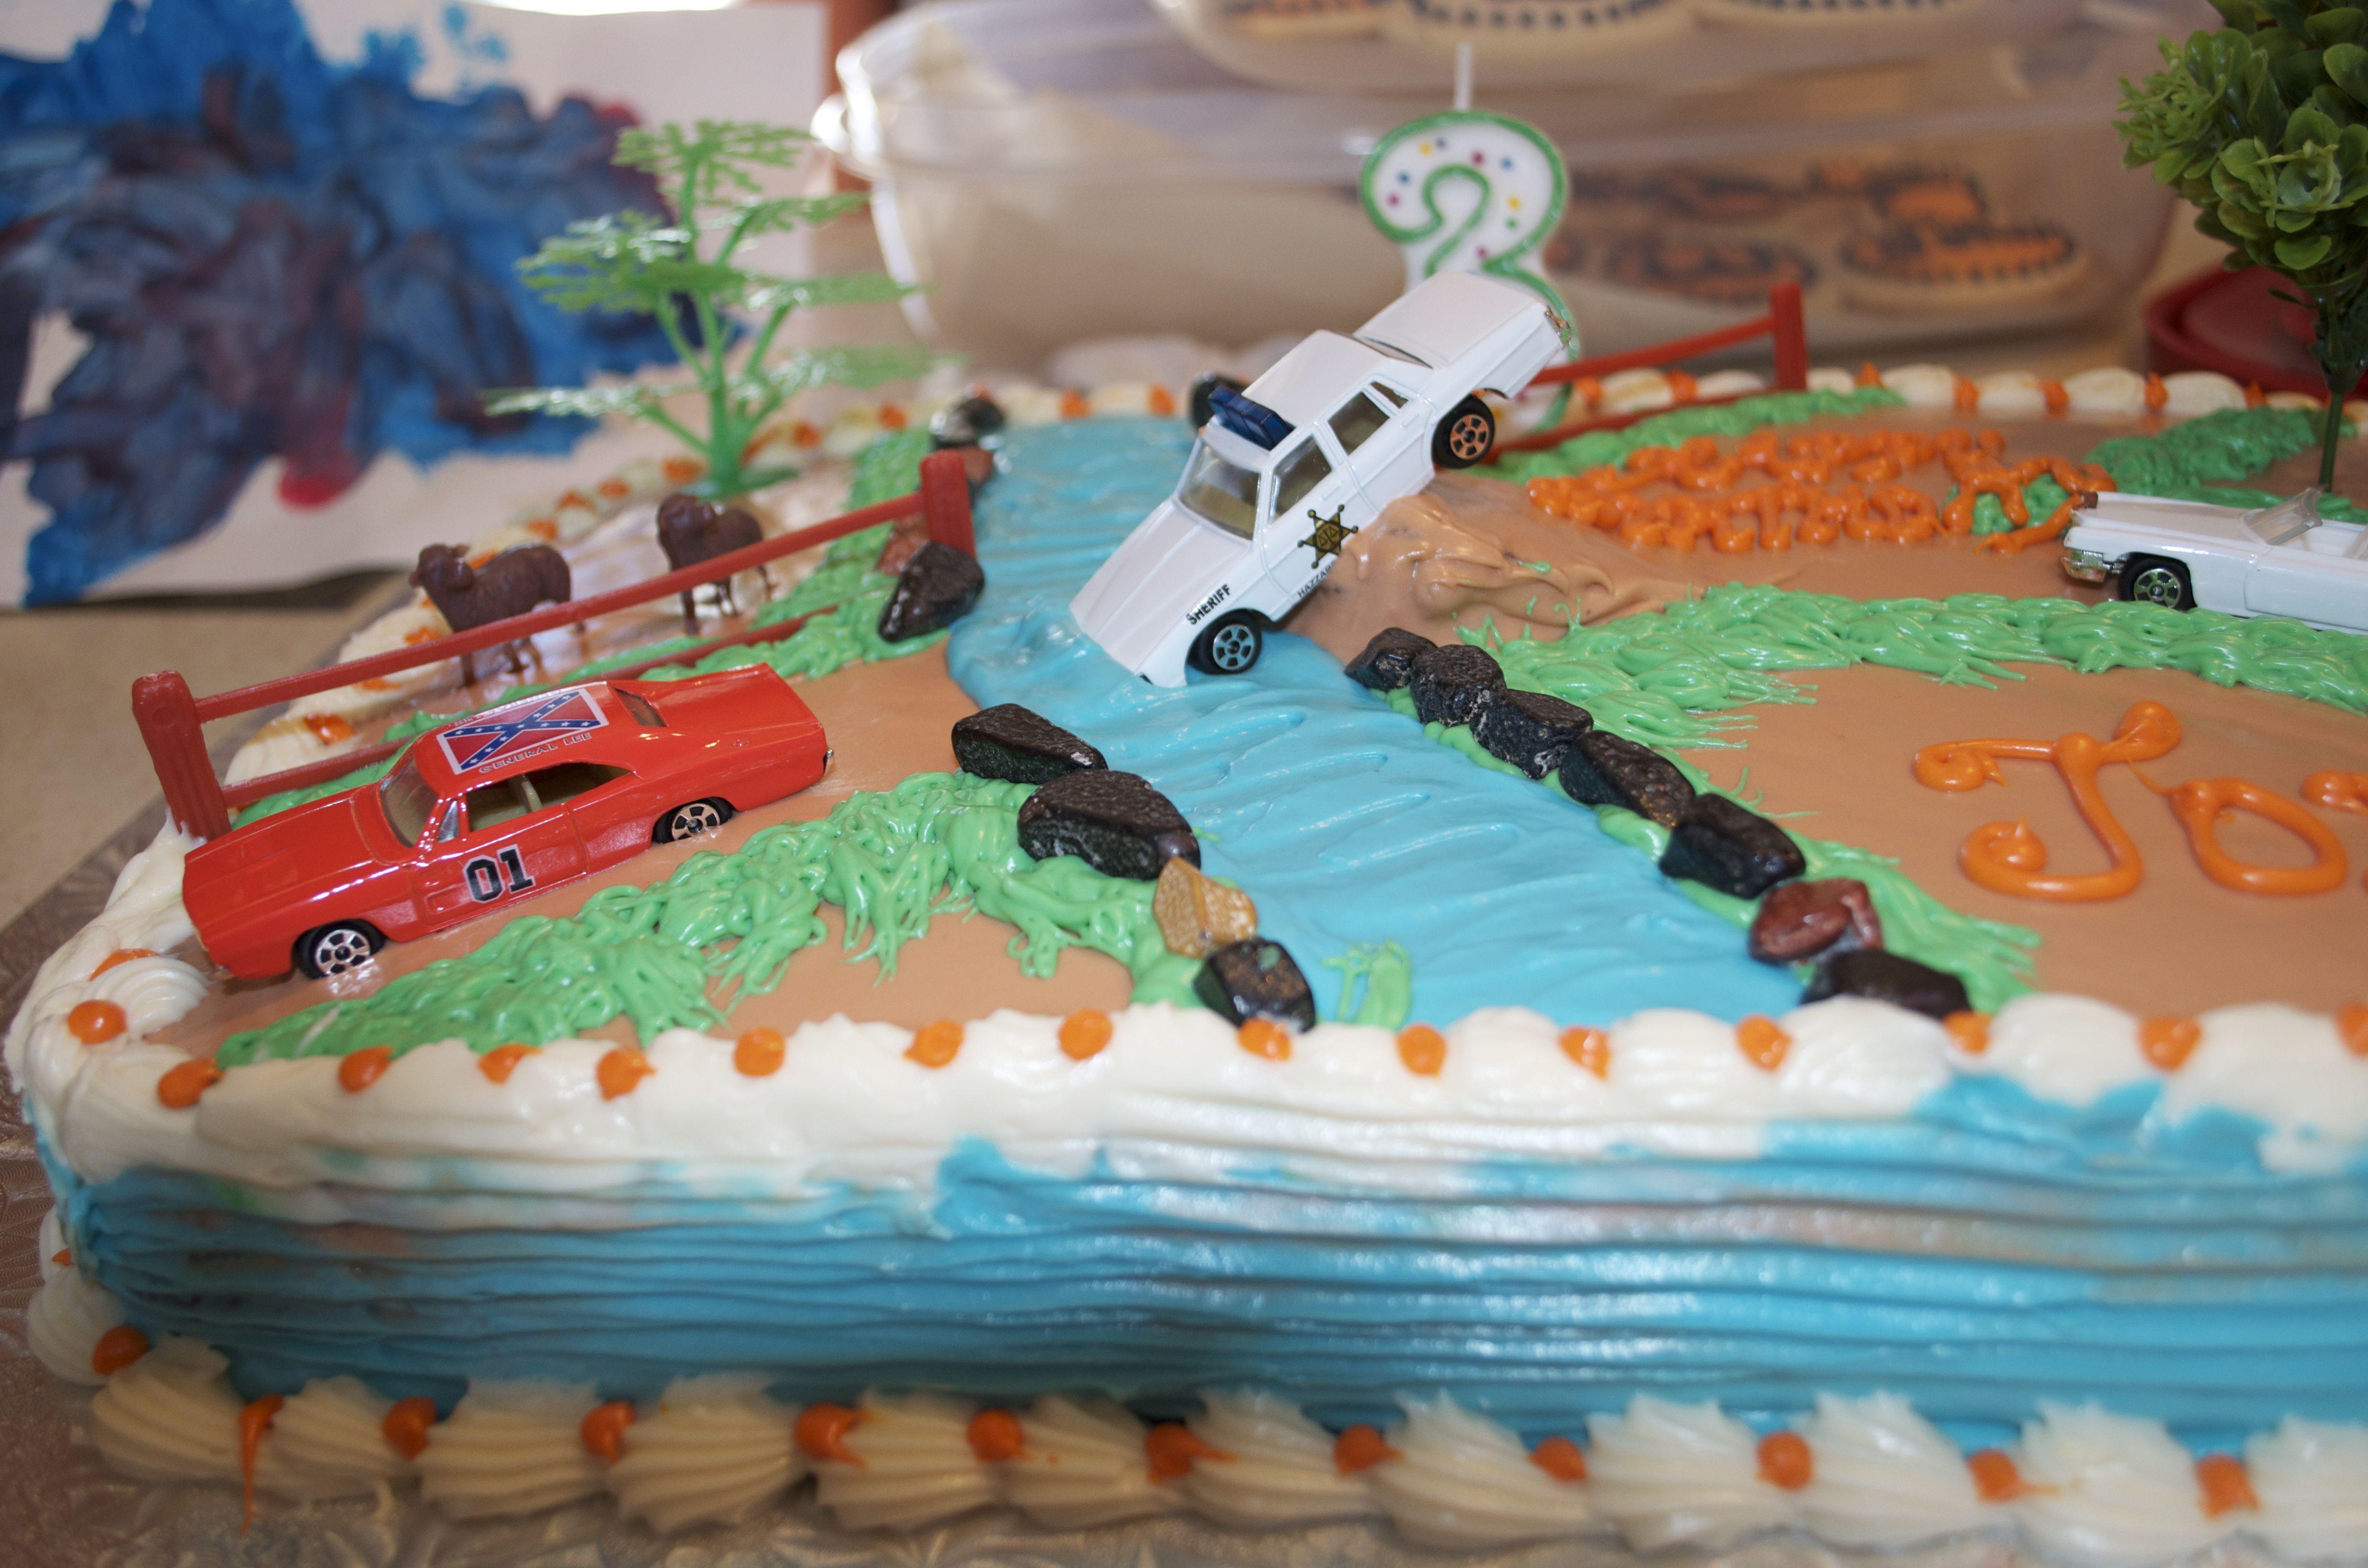 Magnificent Dukes Of Hazzard Cake Adult Birthday Cakes Boy Birthday Cake Personalised Birthday Cards Arneslily Jamesorg